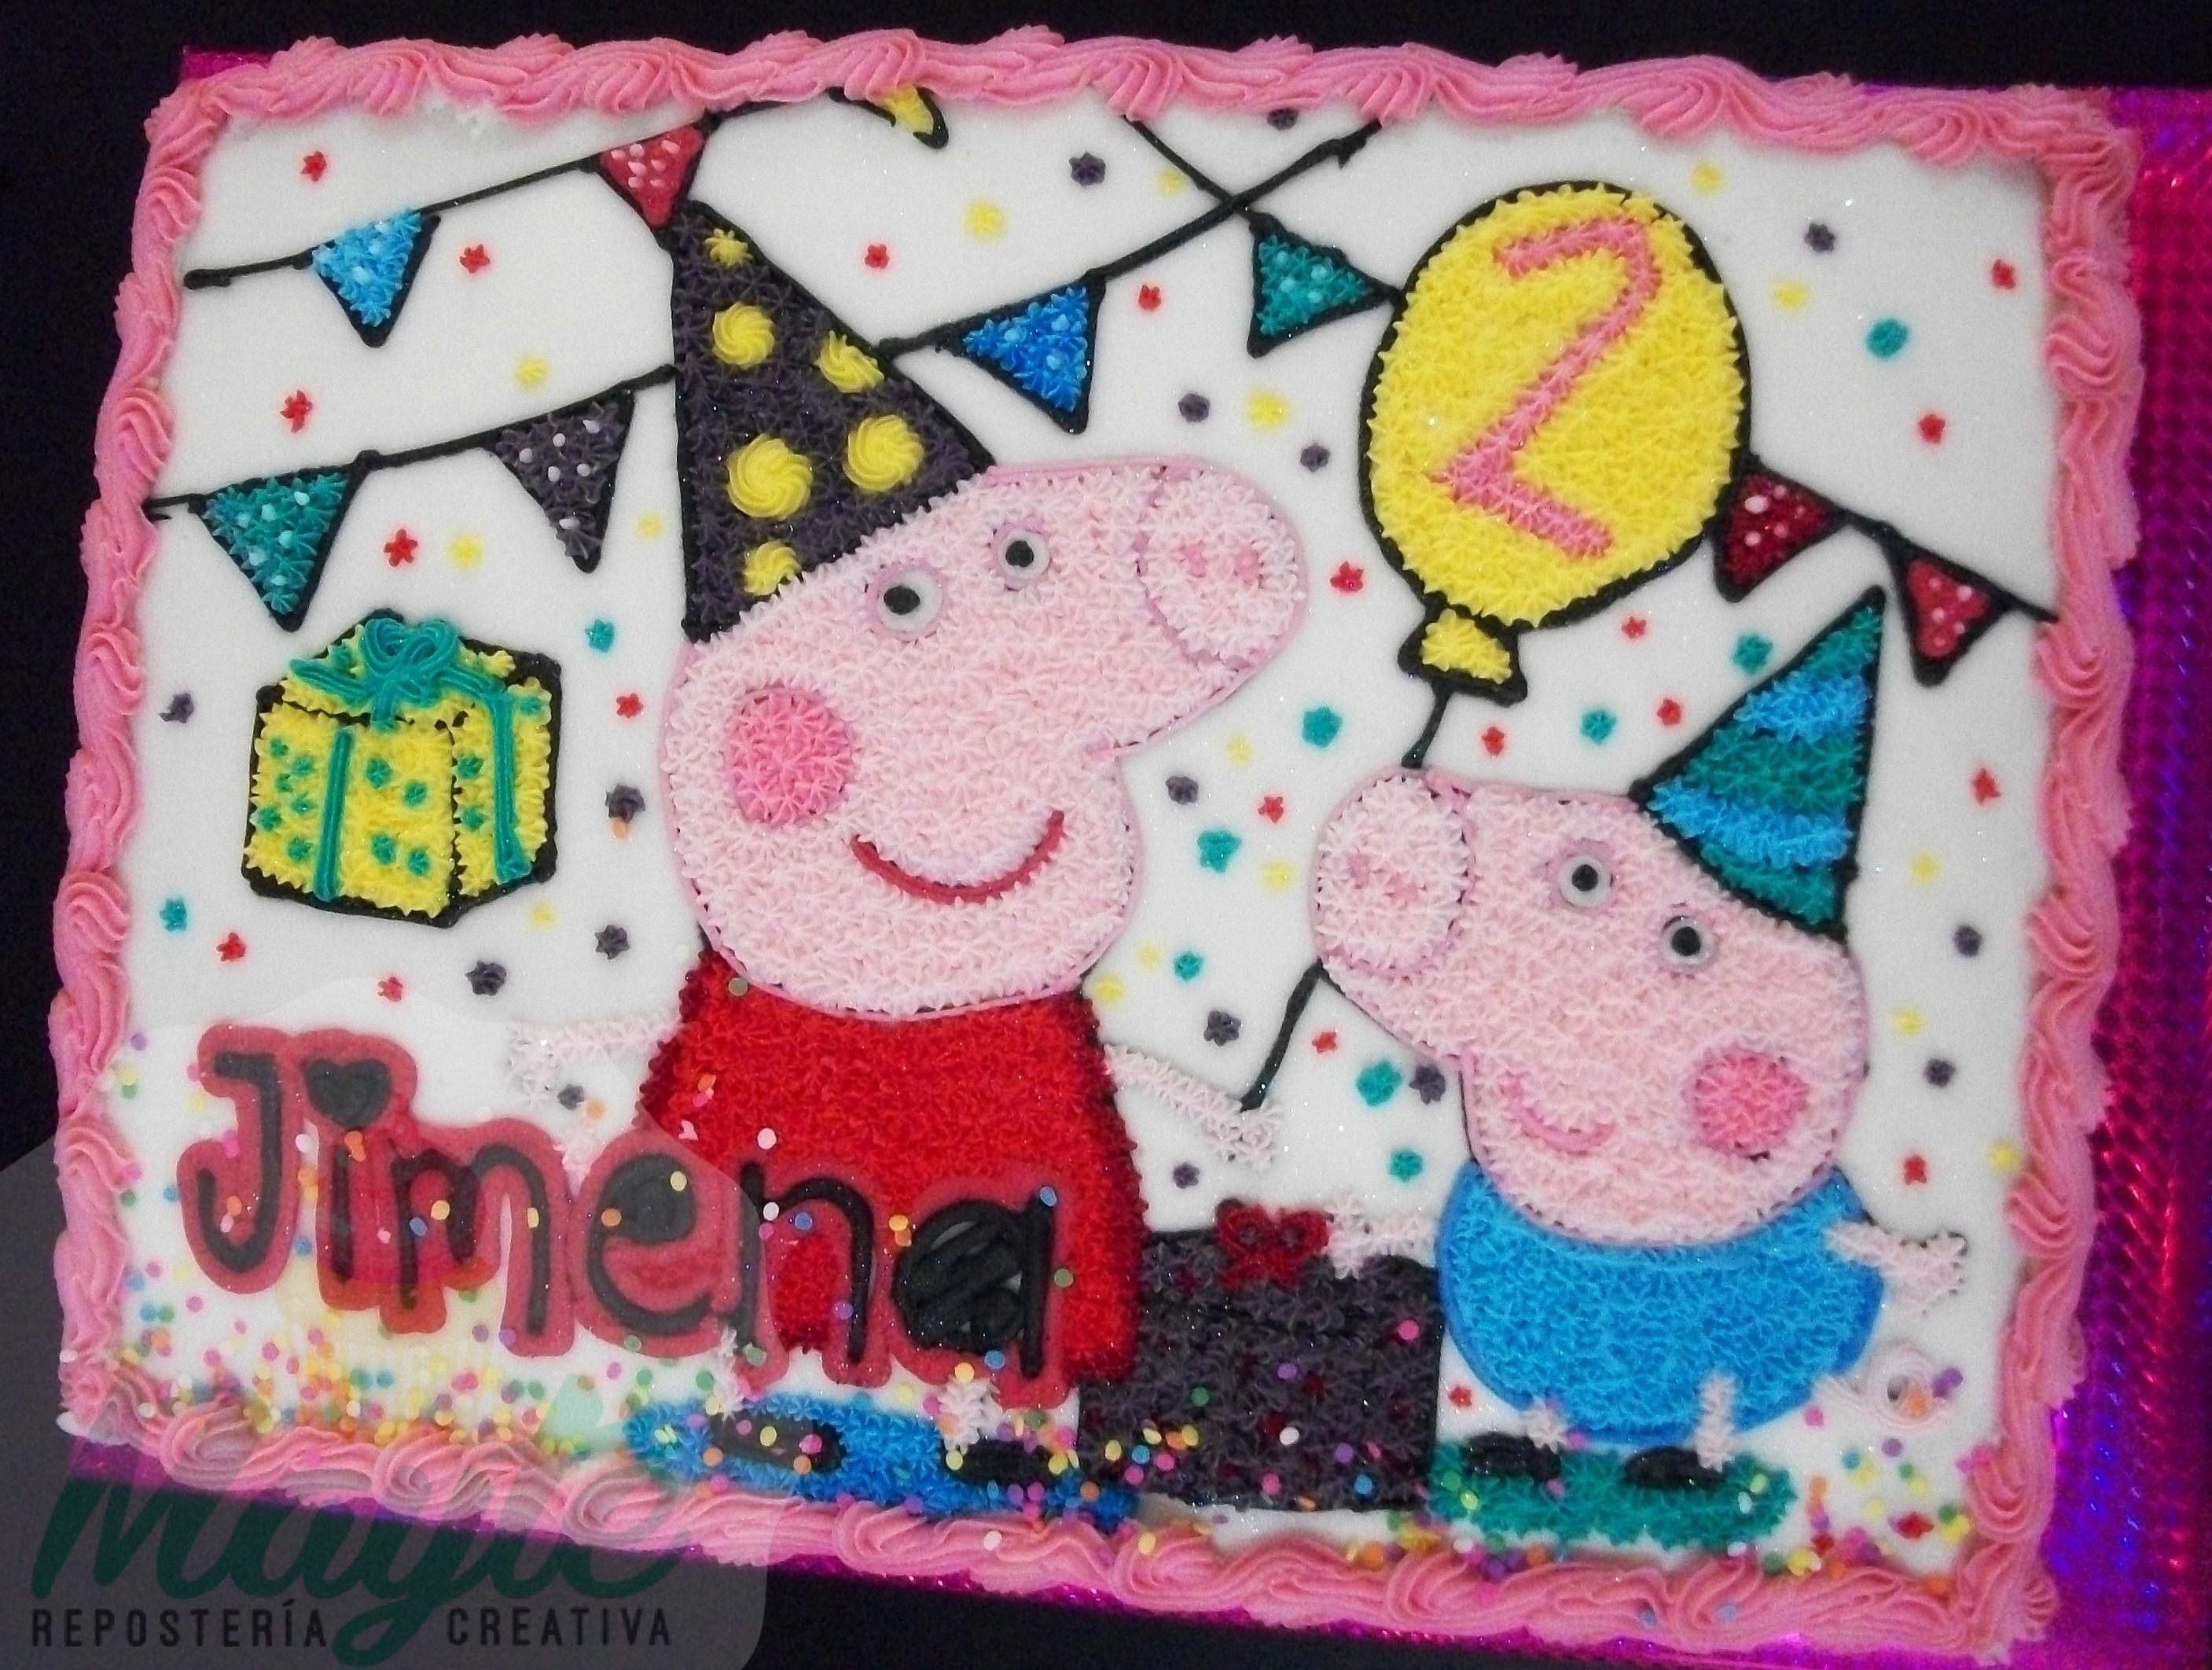 Pin de Cereza en Peppa Pig Cakes / Pasteles de Peppa Pig | Pinterest ...